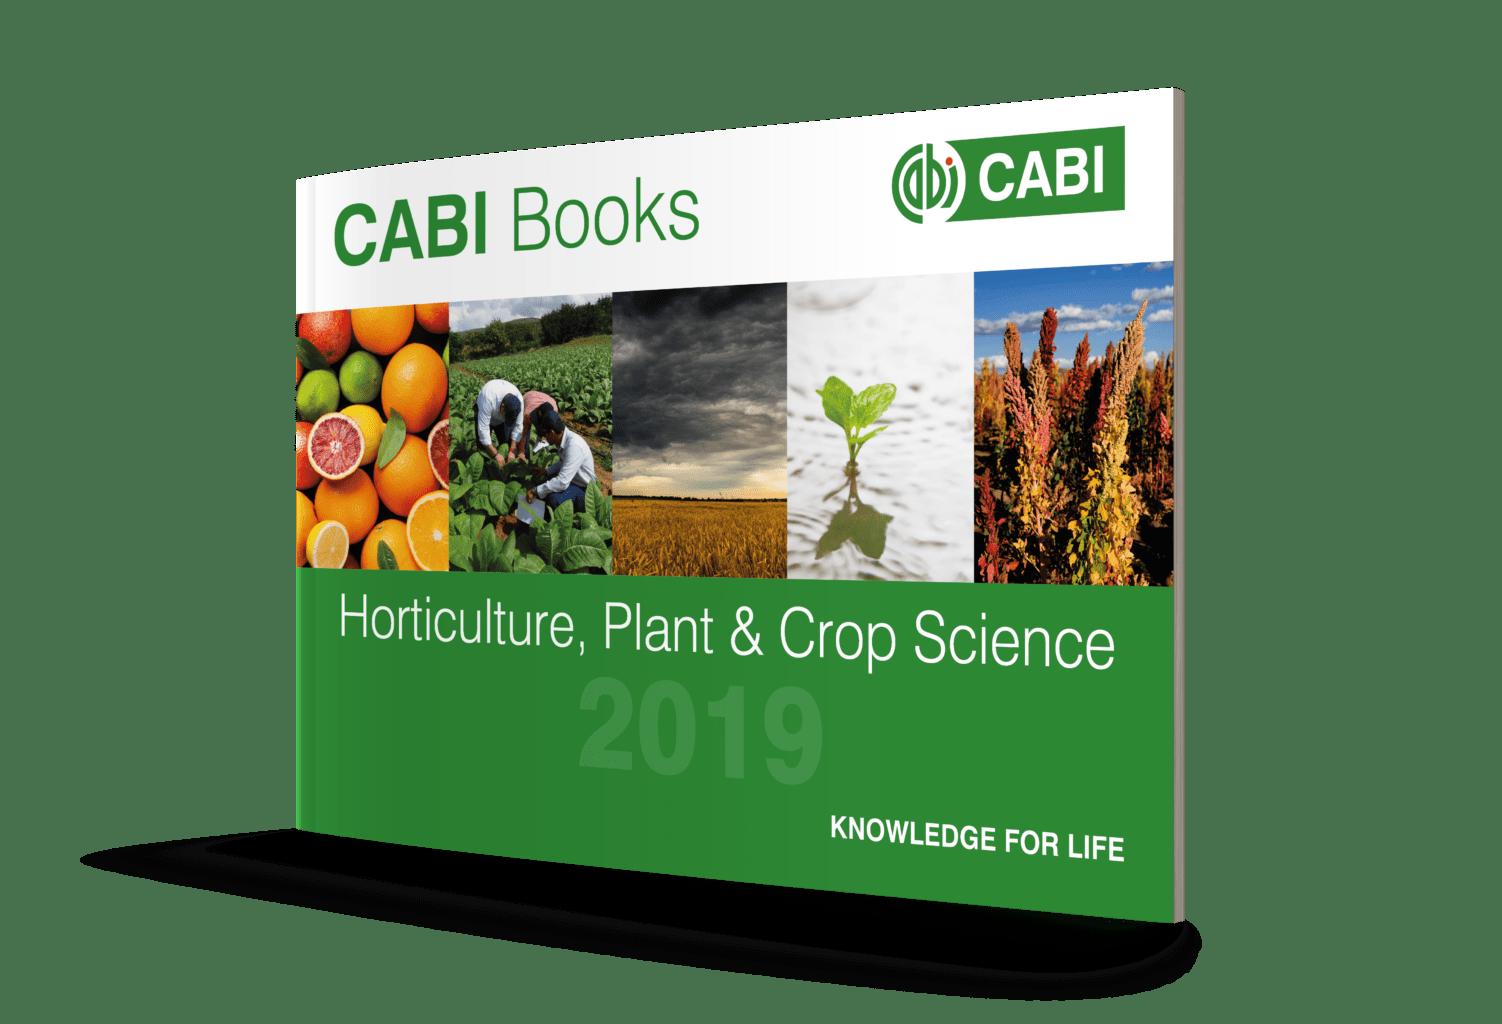 Horticulture, Plant & Crop Science Brochure 2019